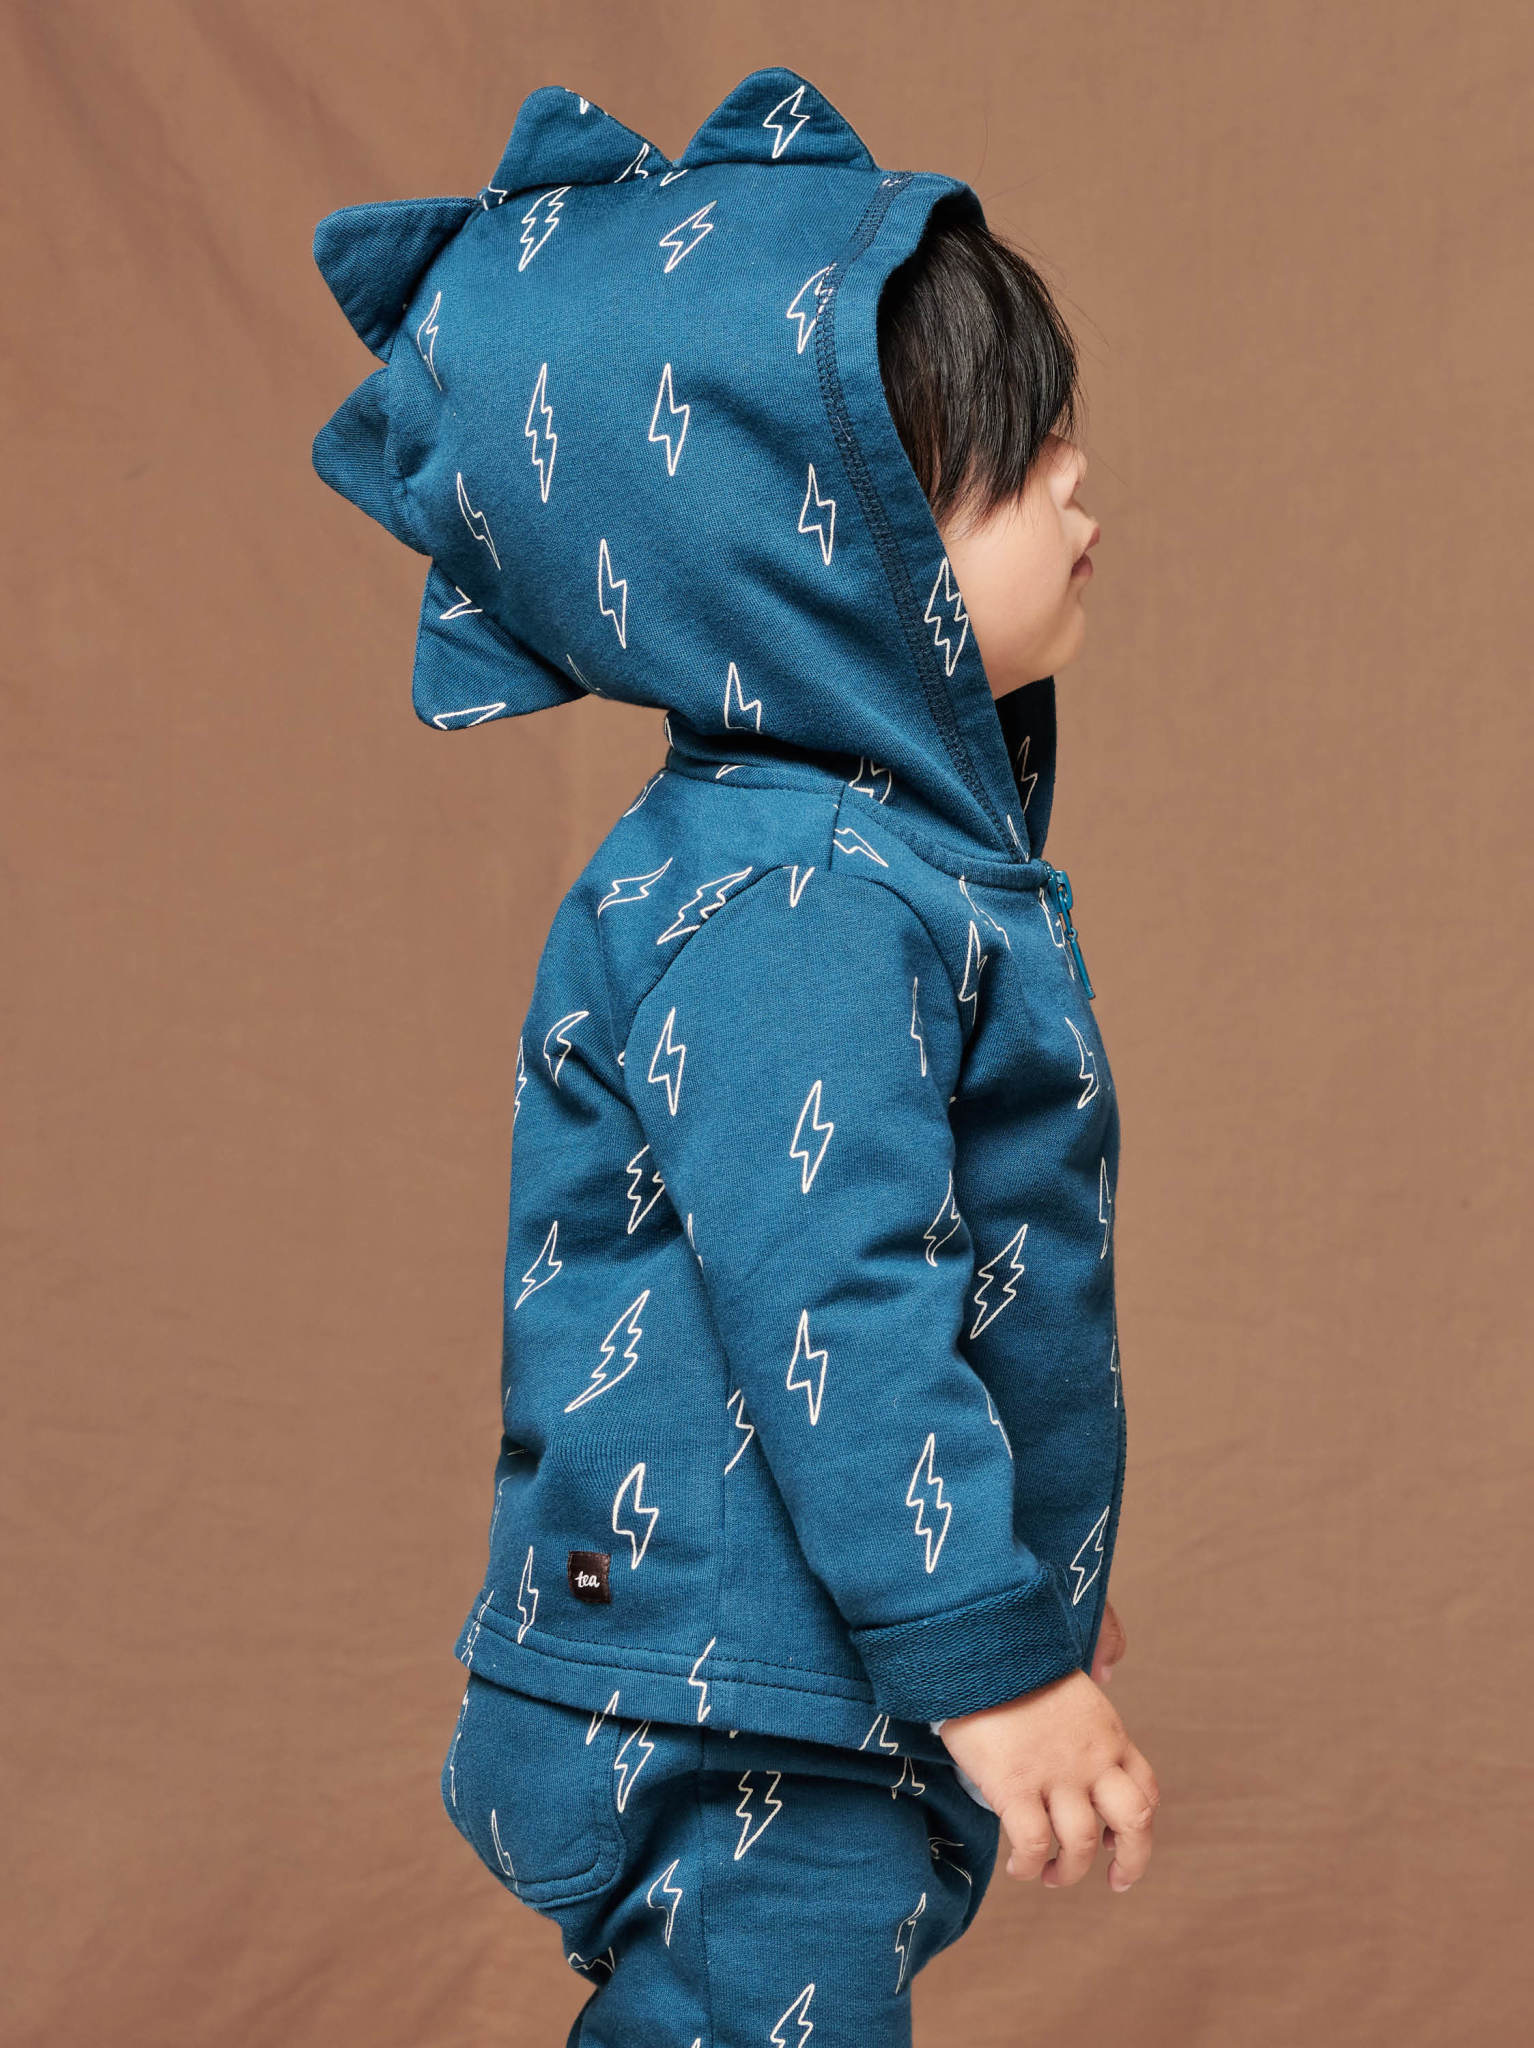 Tea Collection Dinosaur Hoodie - Blixt Bolts